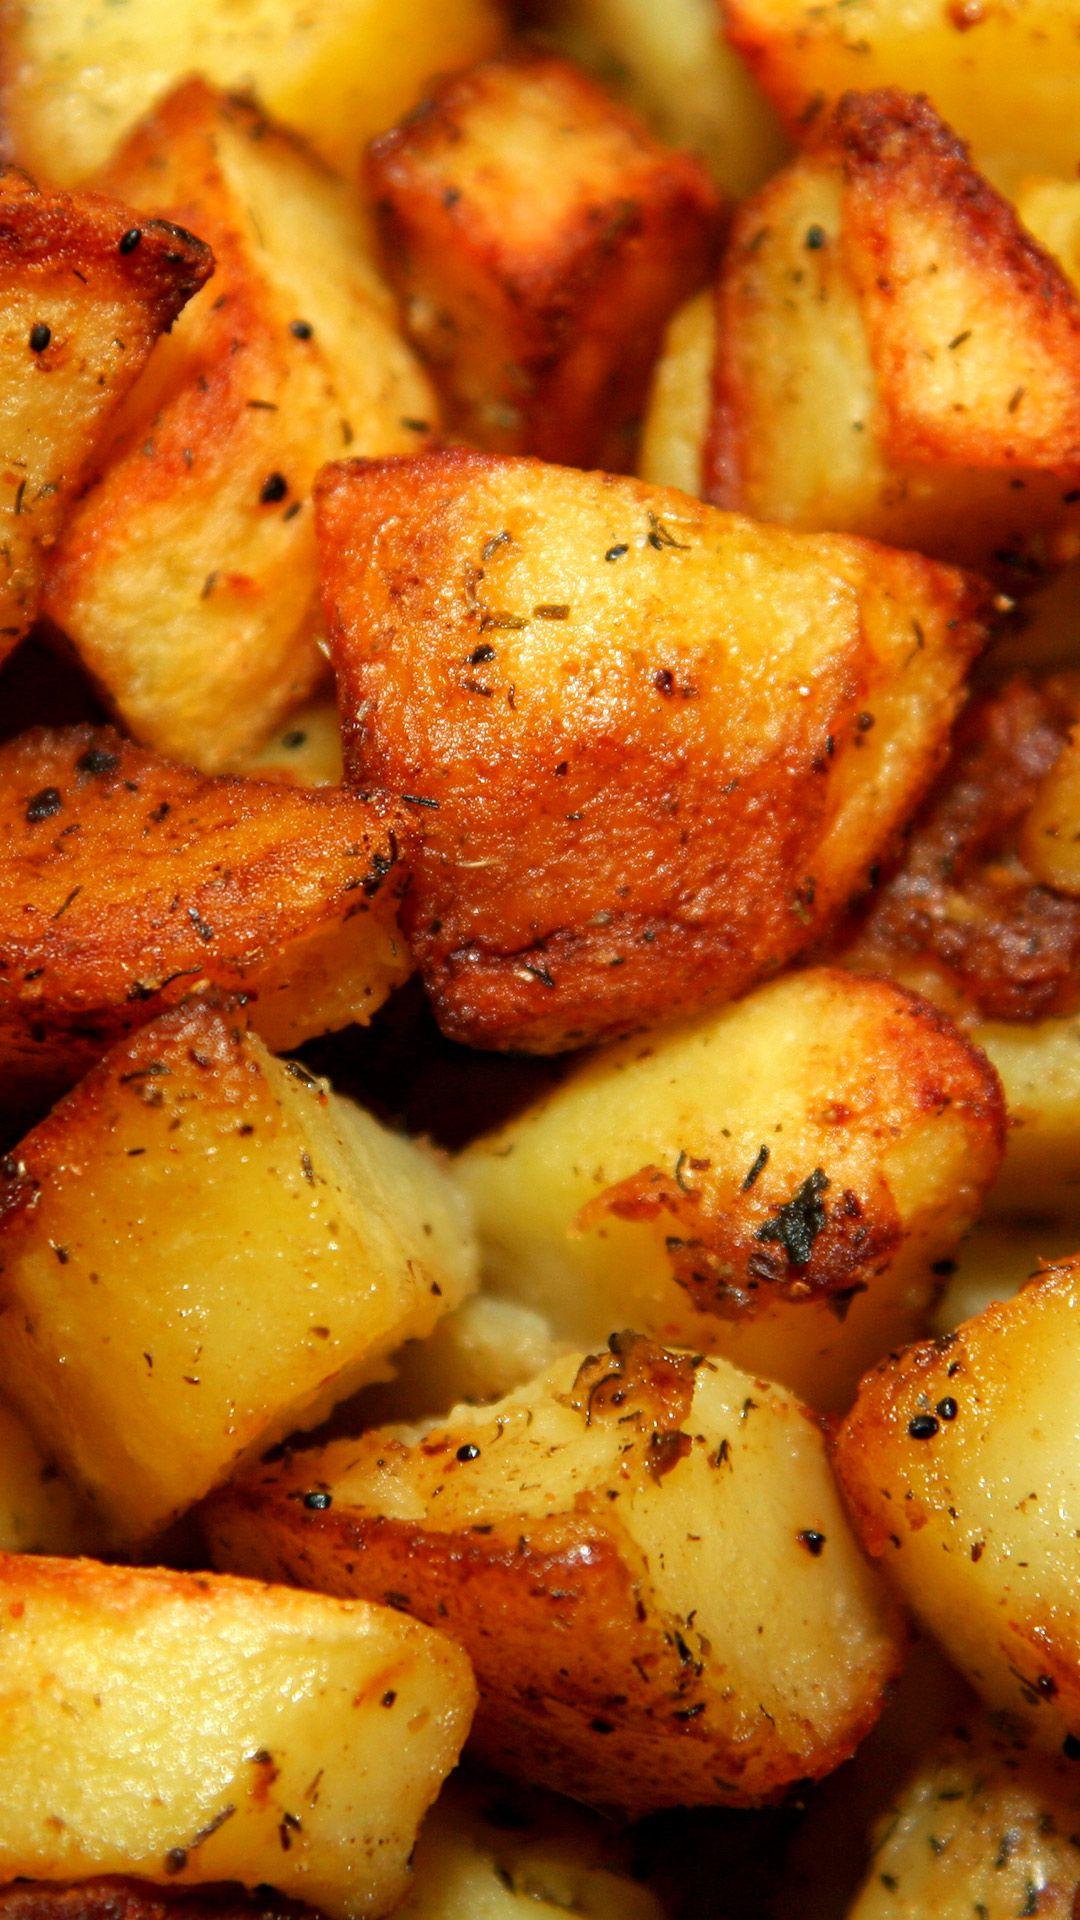 OVEN ROASTED POTATOES | Nonna Roasted Potatoes Rec